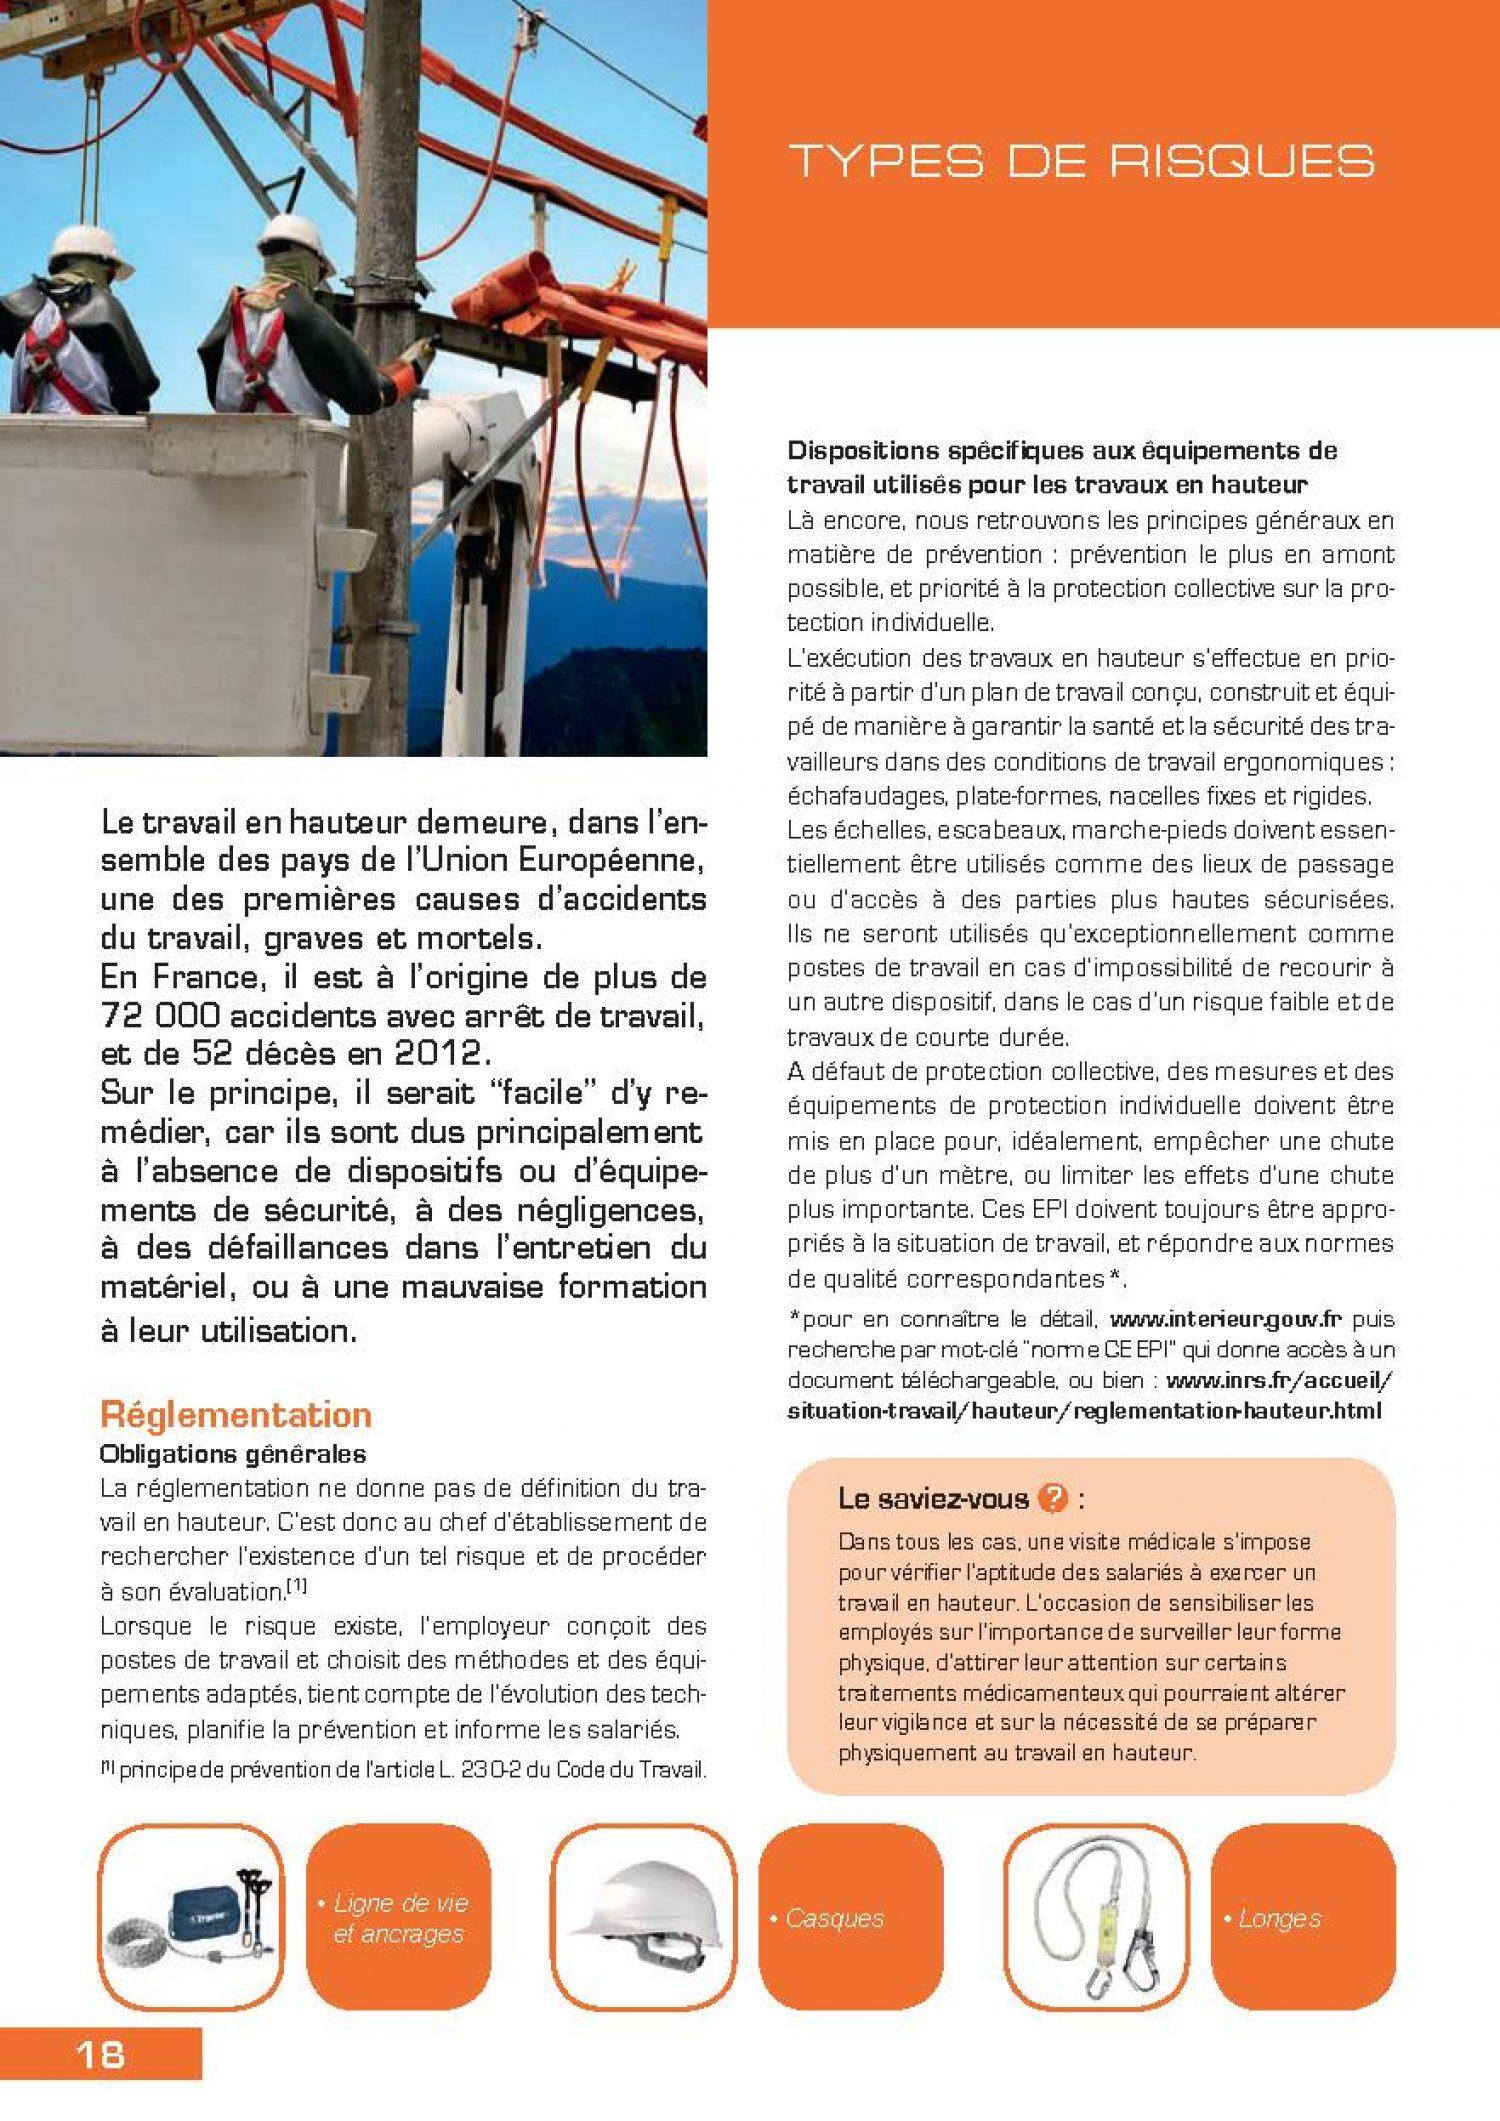 Guide Securite au Travail 2014 HDpdf_Page_18